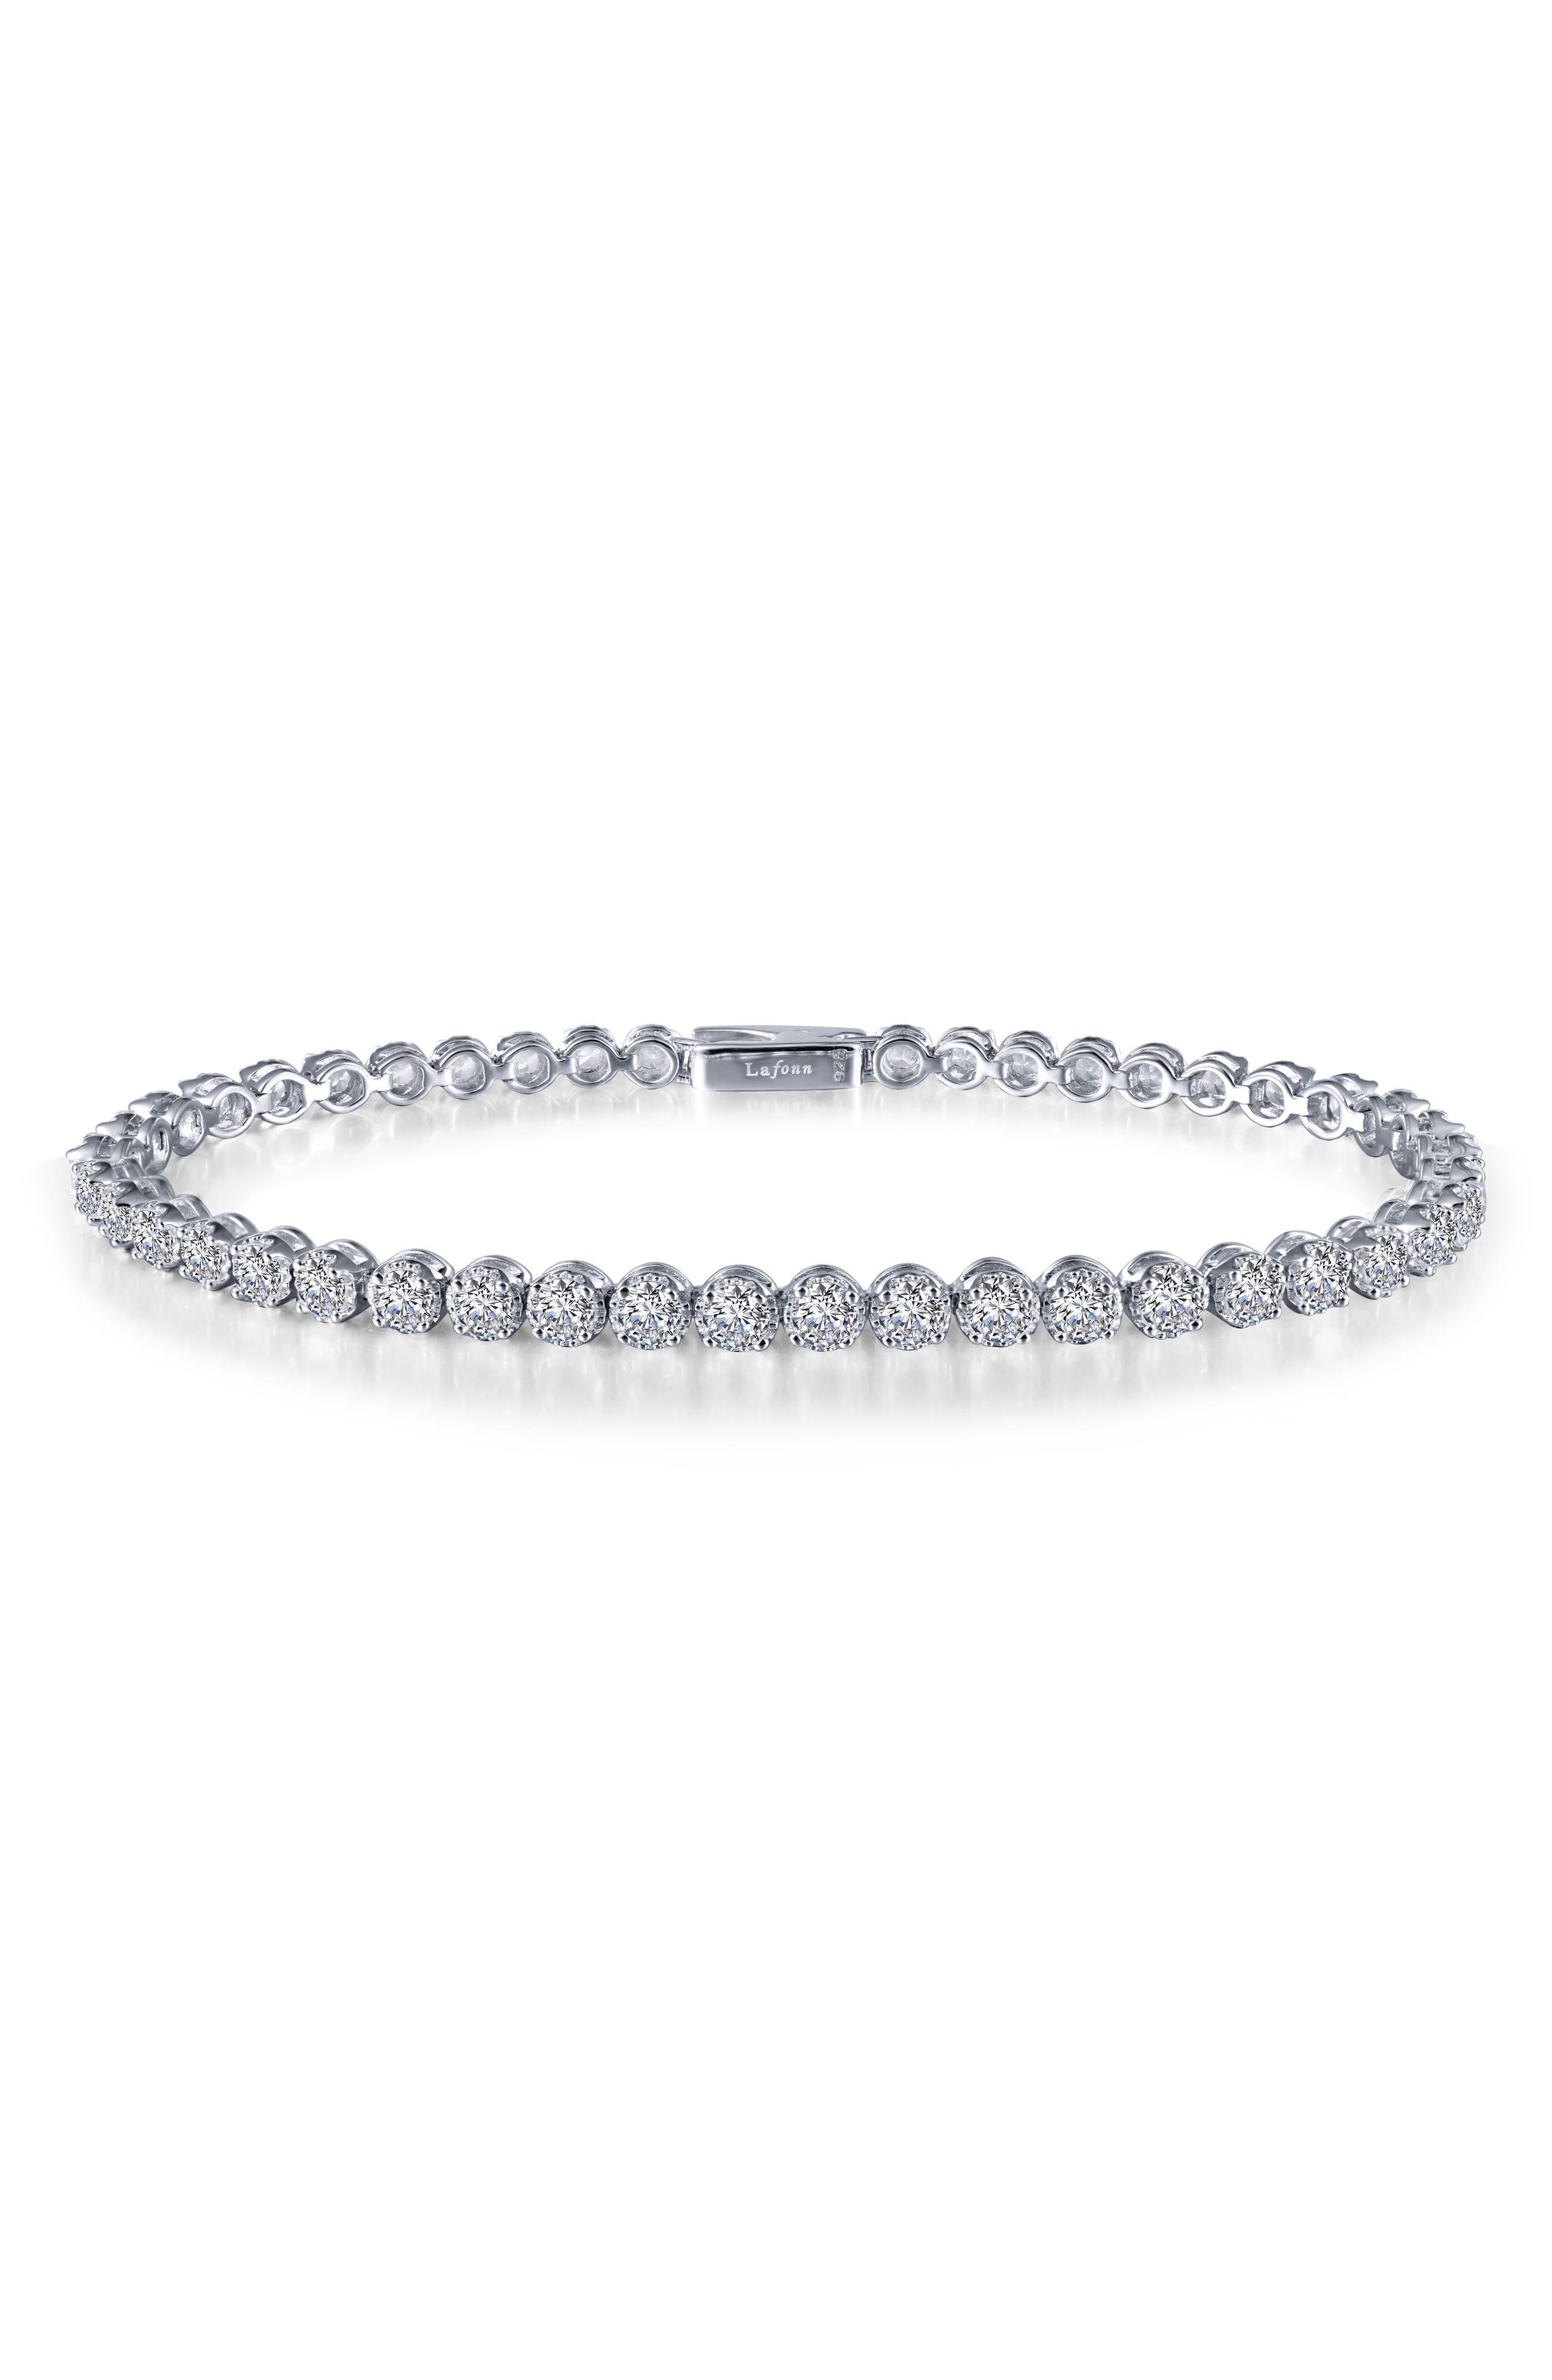 Alternate Image 1 Selected - Lafonn Simulated Diamond Tennis Bracelet